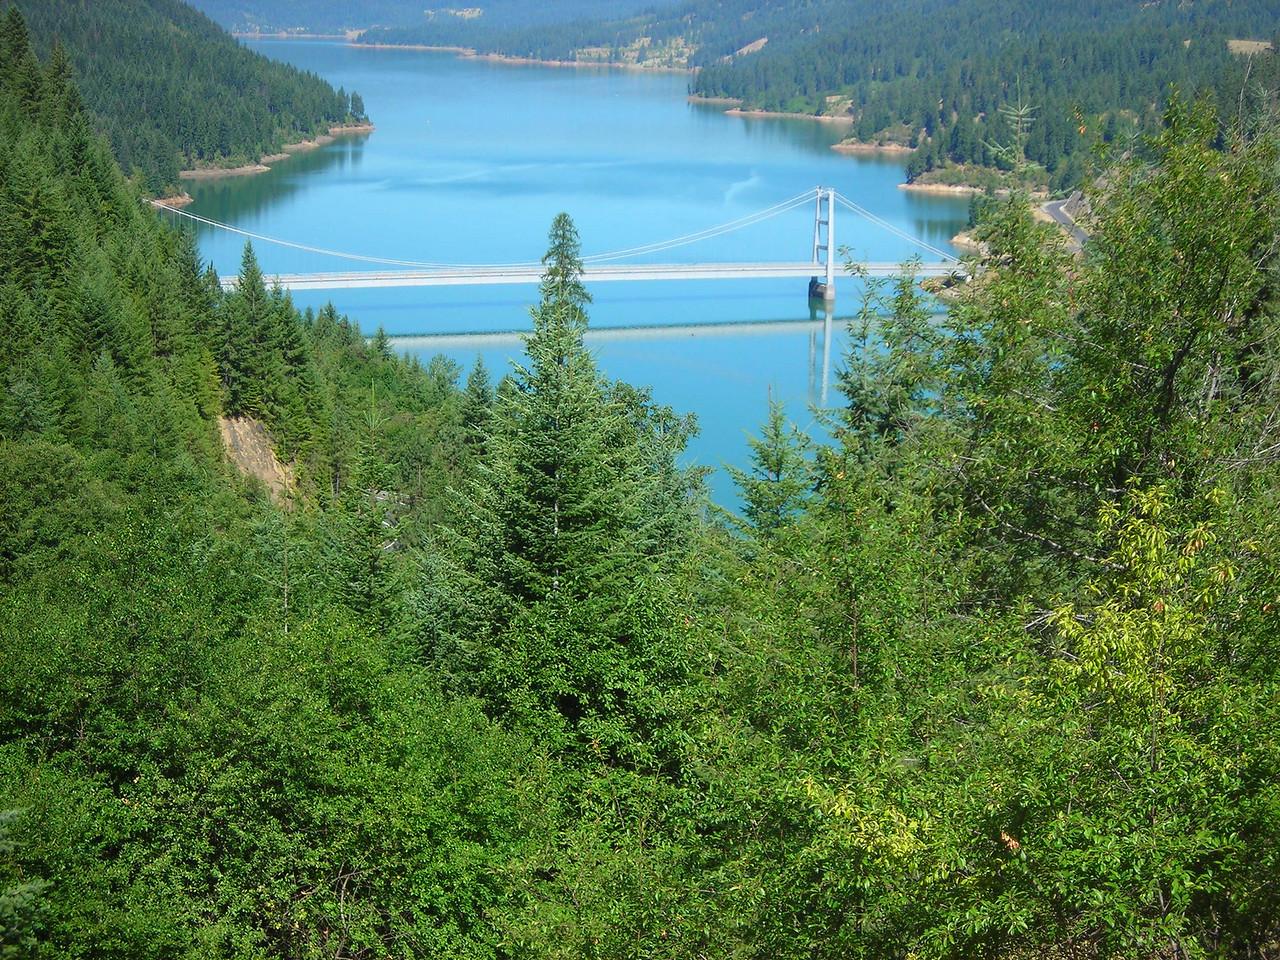 Dent Bridge and Dworshak Reservoir